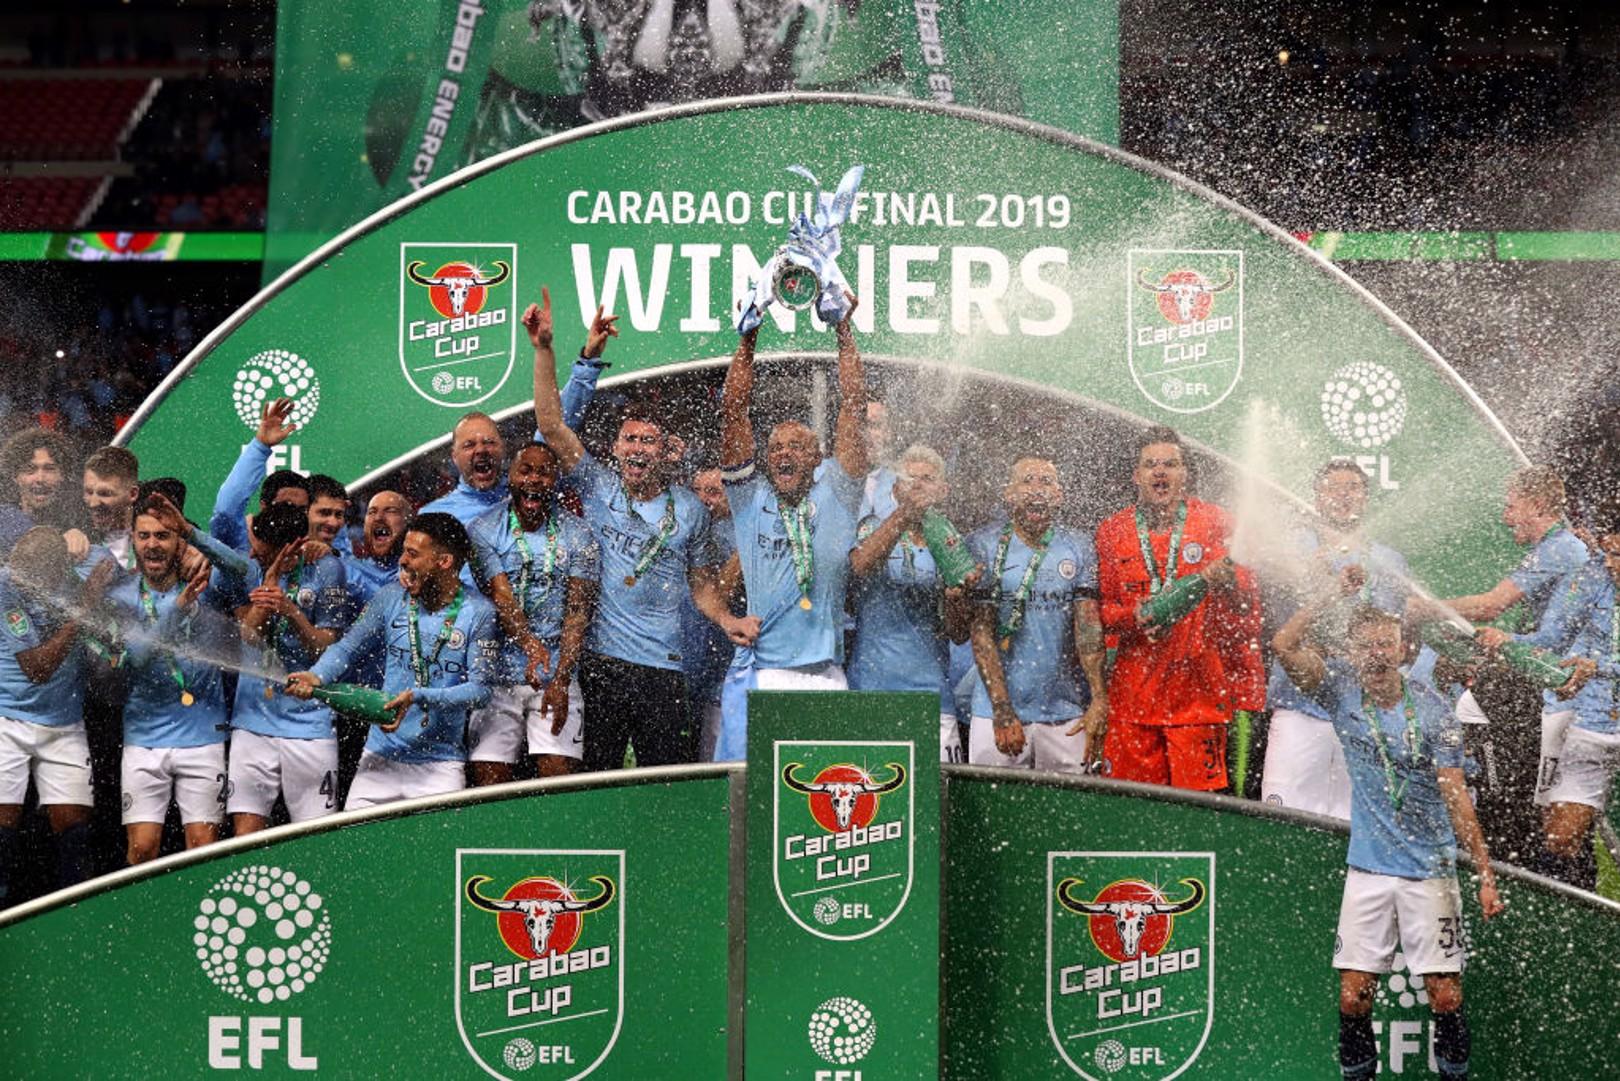 WINNERS: Vincent Kompany hoists the Carabao Cup aloft in 2019.